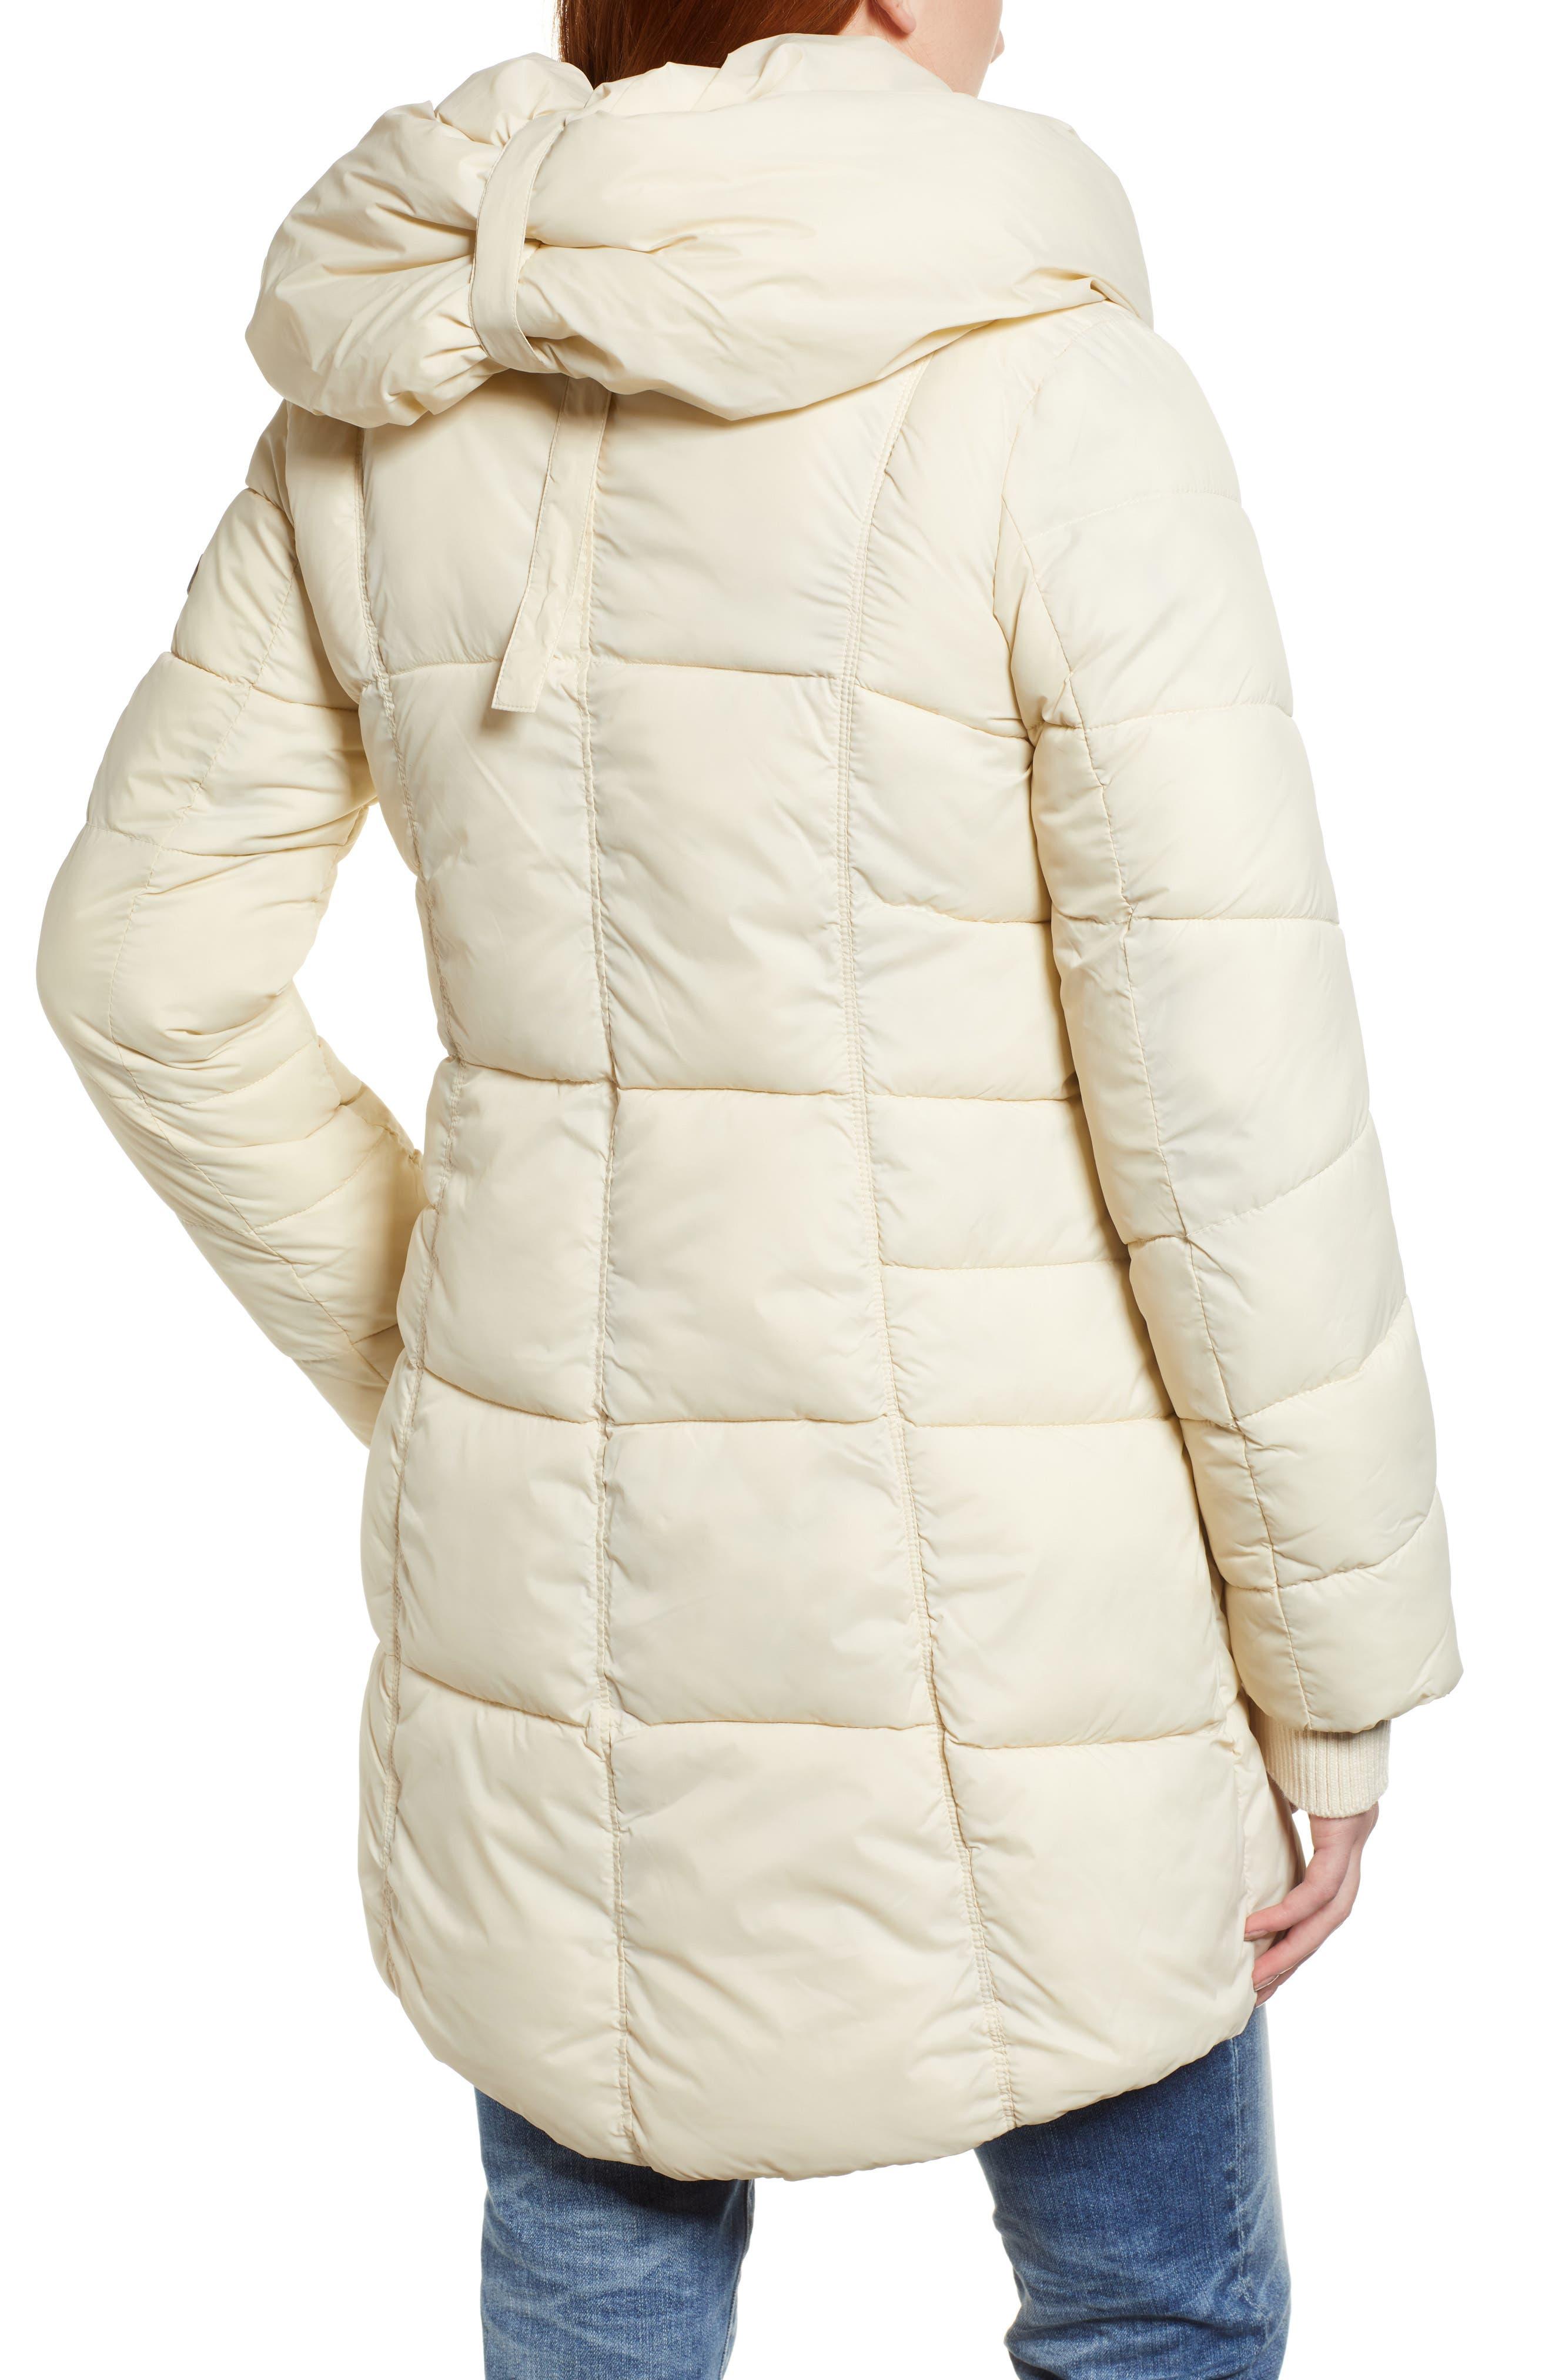 Pillow Collar Puffer Coat,                             Alternate thumbnail 2, color,                             IVORY